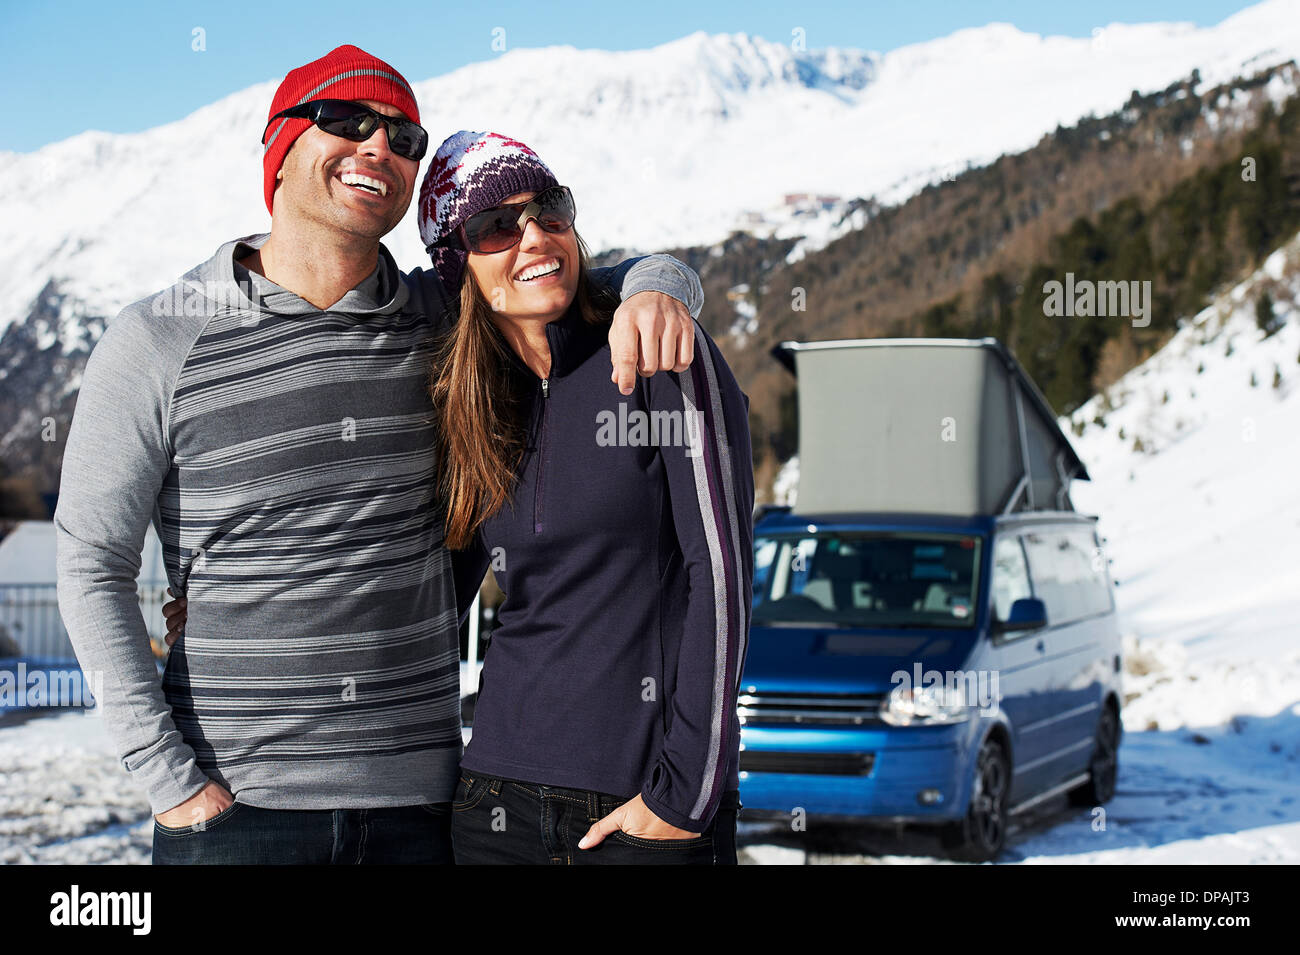 A mediados pareja adulta con el coche en el fondo, Obergurgl, Austria Imagen De Stock